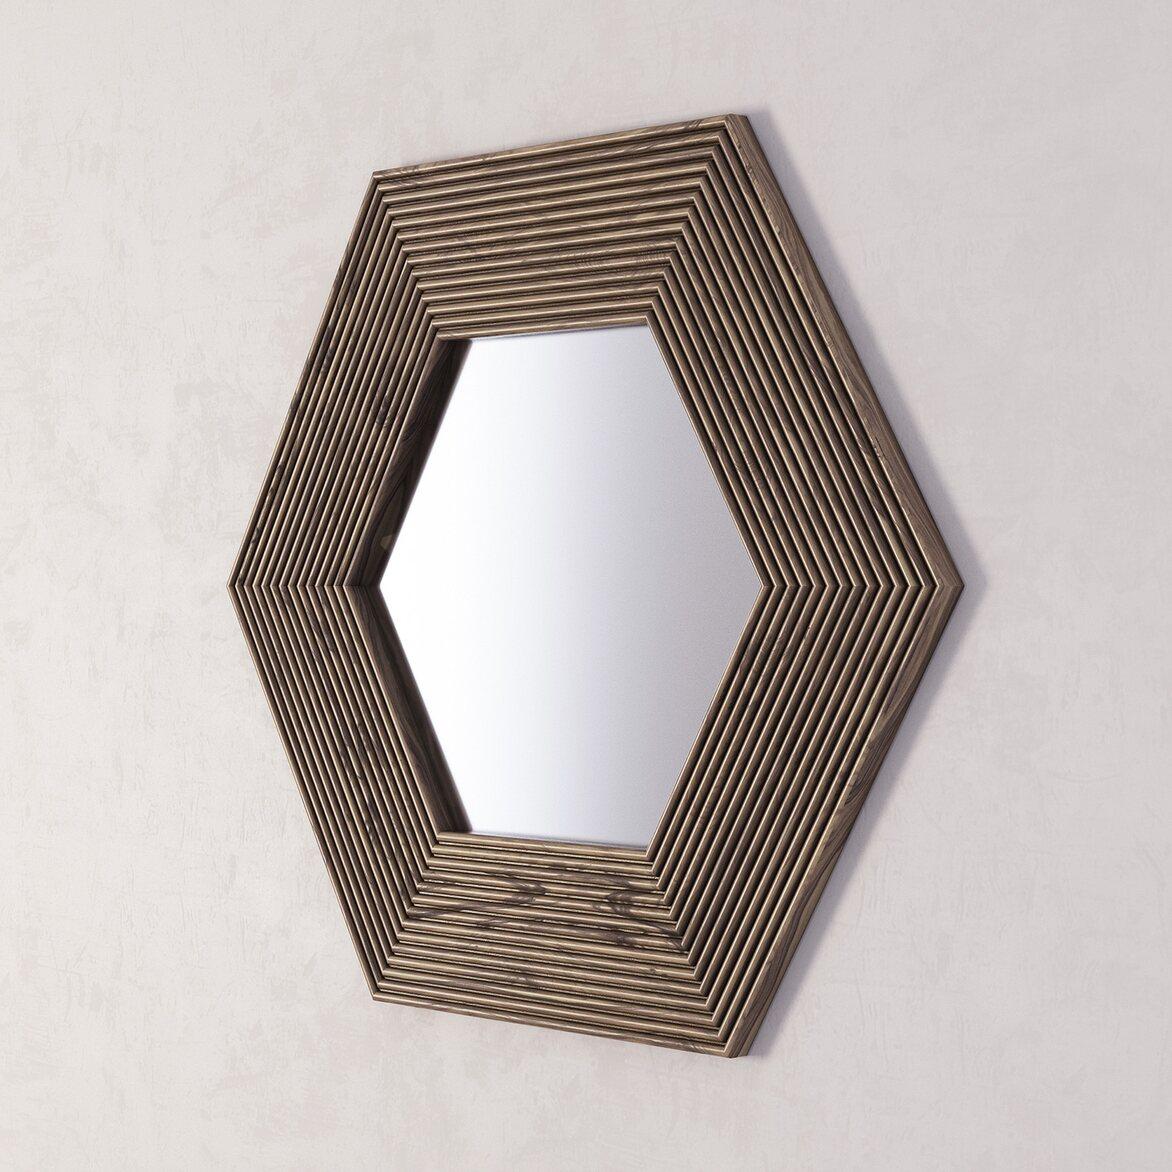 Зеркало Сorners 2 | Настенные зеркала Kingsby